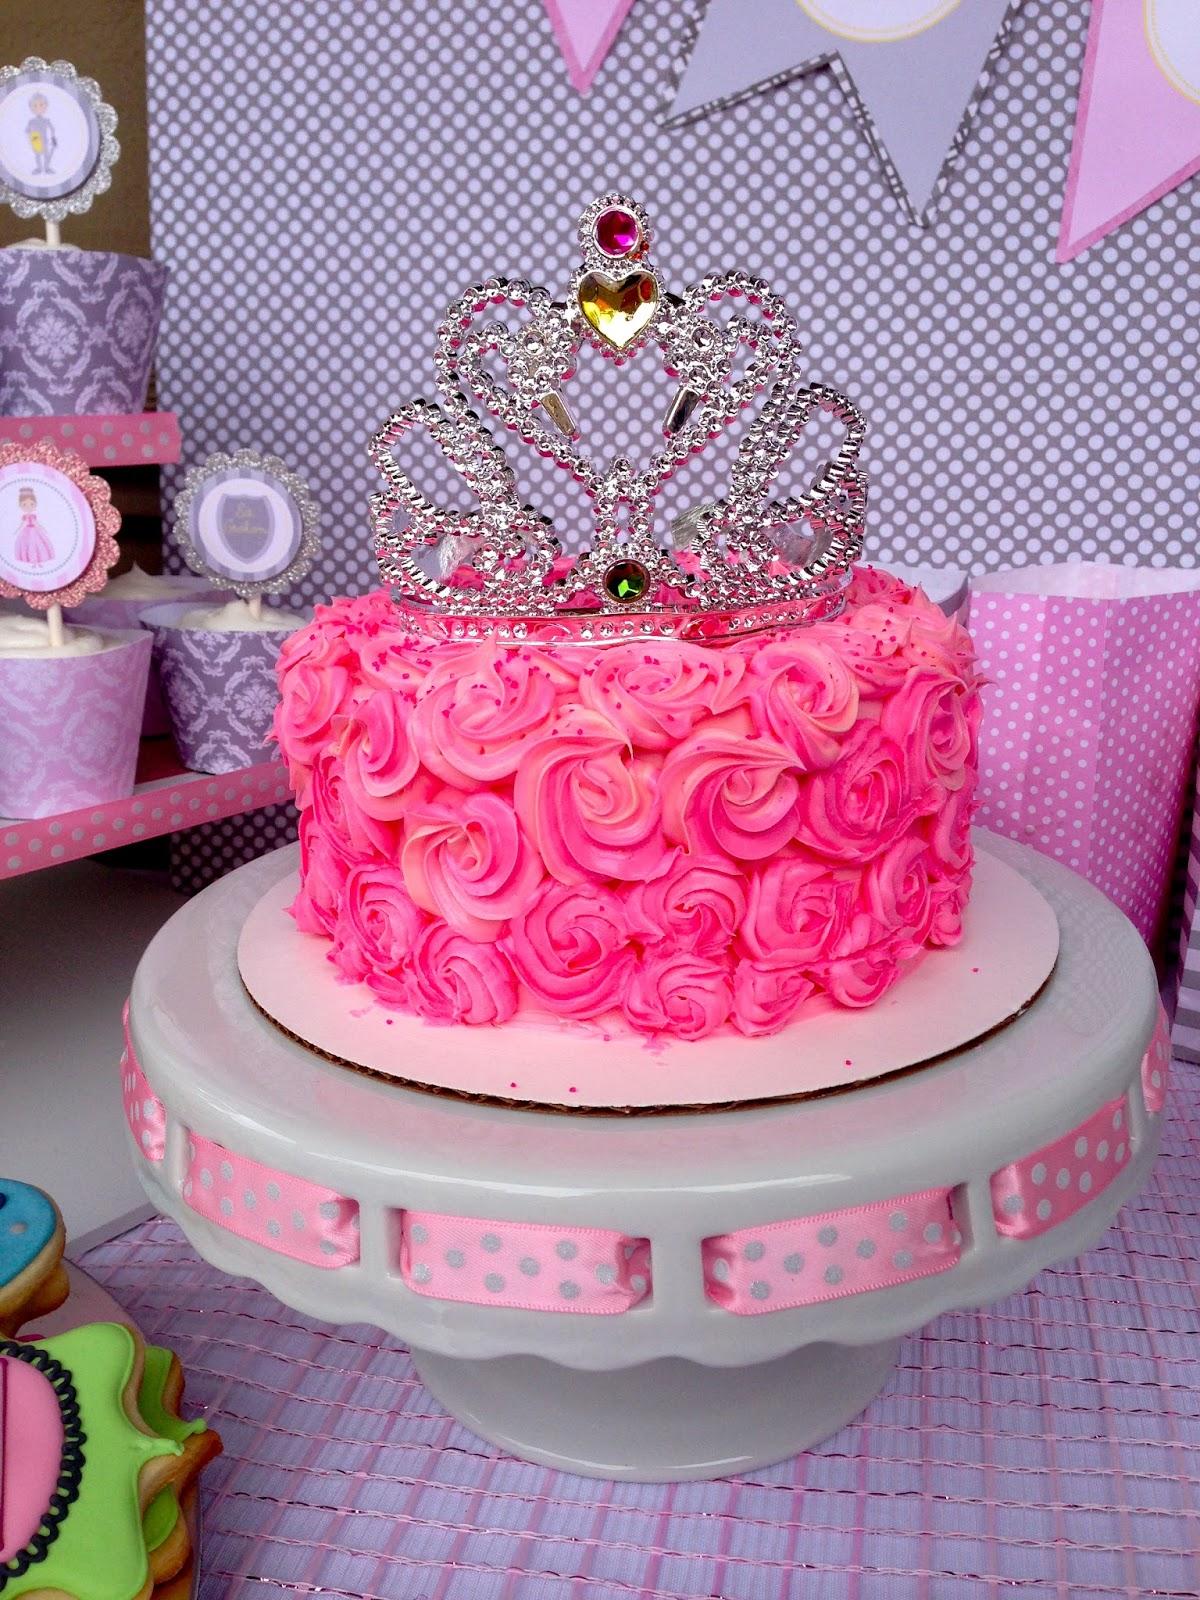 Poppy Rose Cake Design : Poppy Event Design: A Royal Celebration